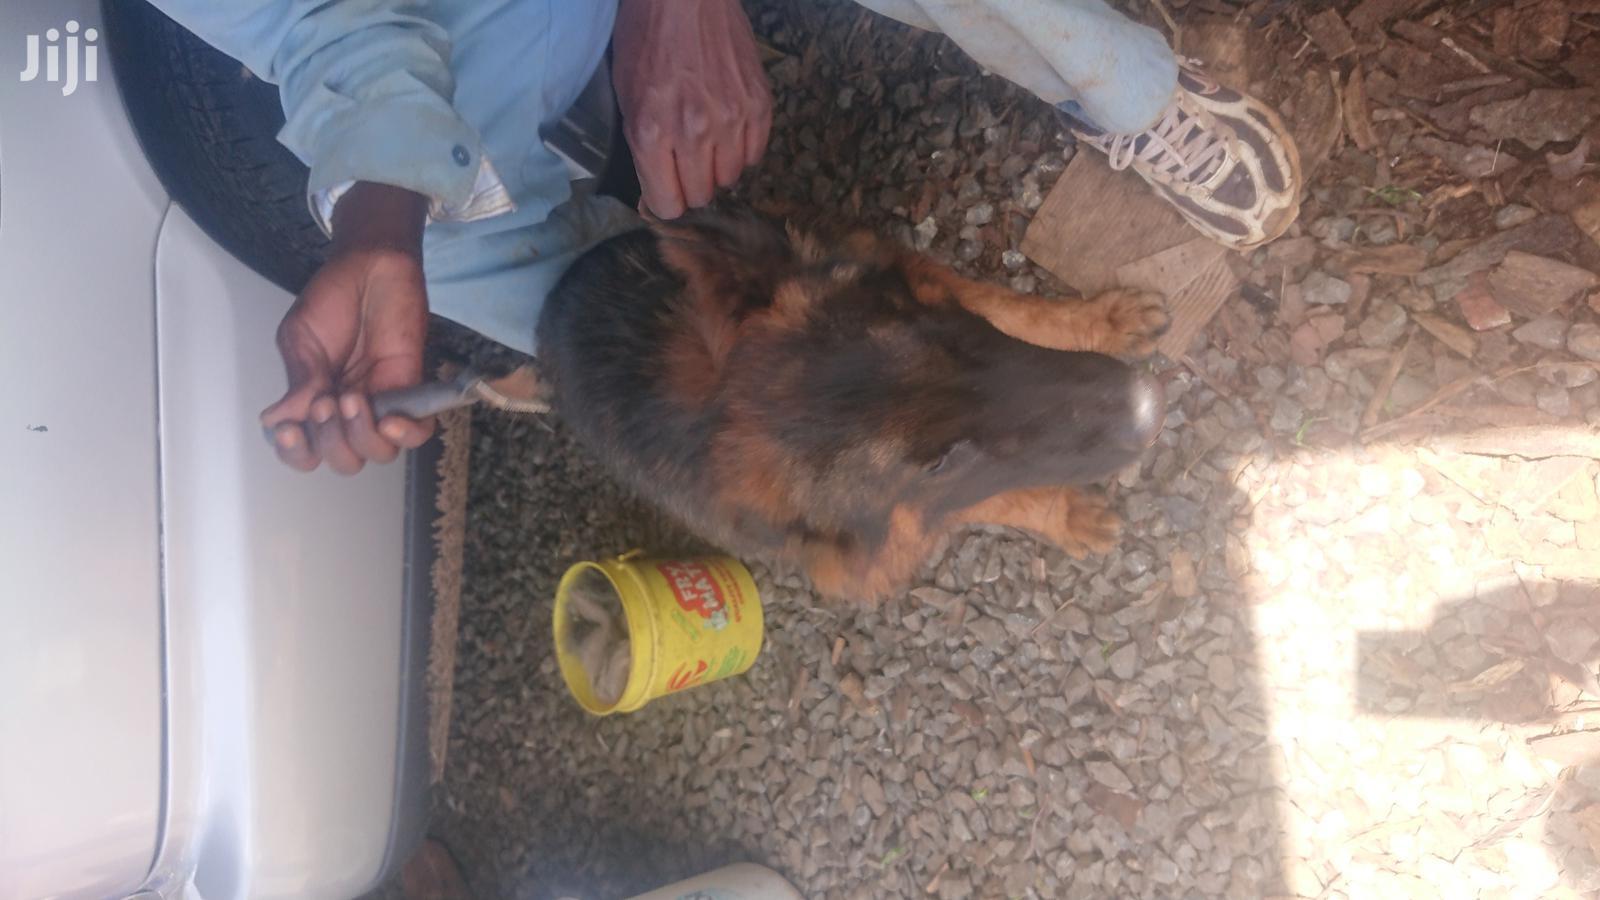 1-3 Month Female Purebred German Shepherd | Dogs & Puppies for sale in Kerugoya, Kirinyaga, Kenya